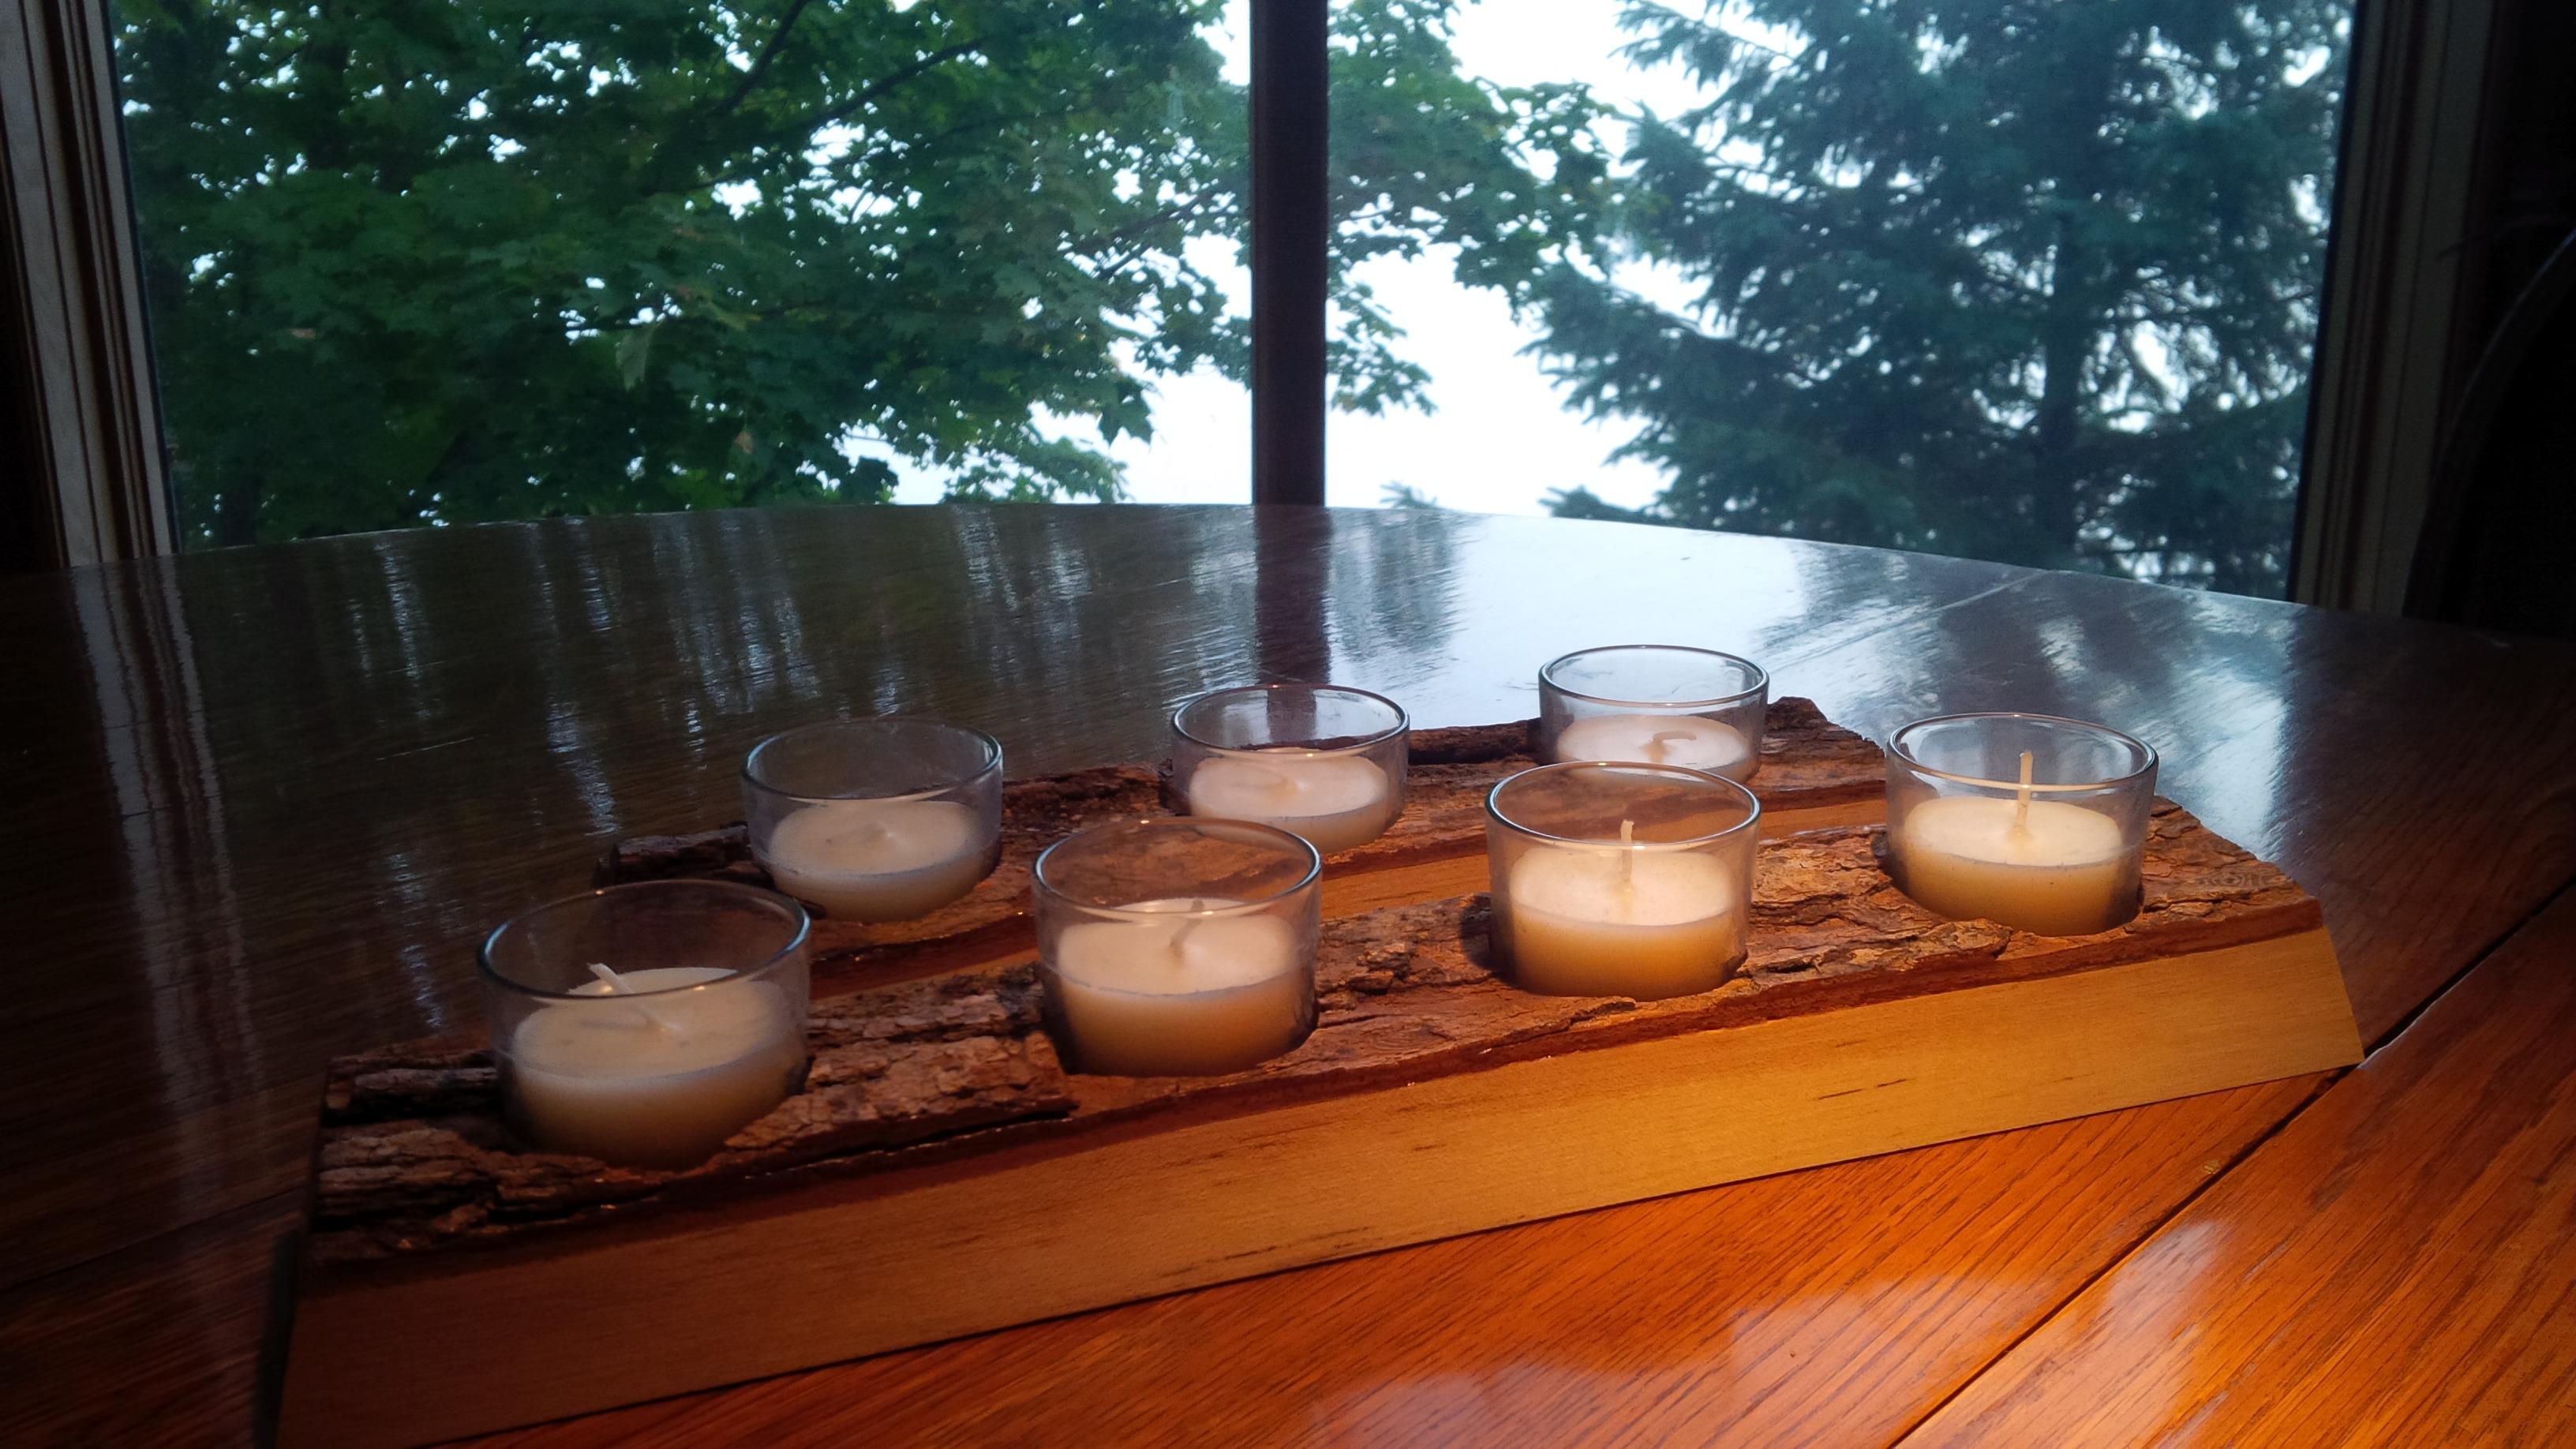 Horizontal Maple Candle Holders